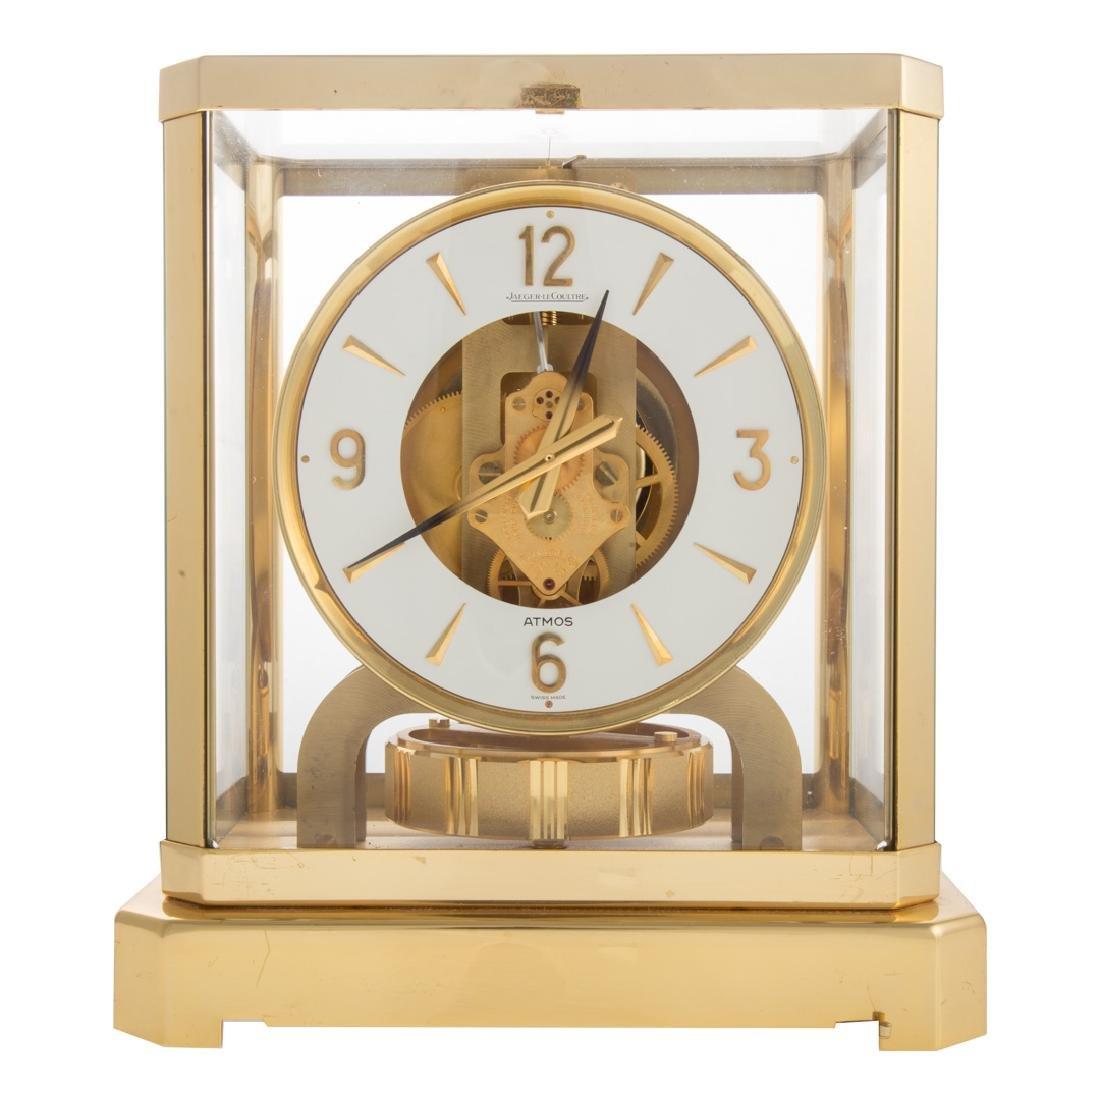 Jaegar-LeCoultre brass Atmos clock